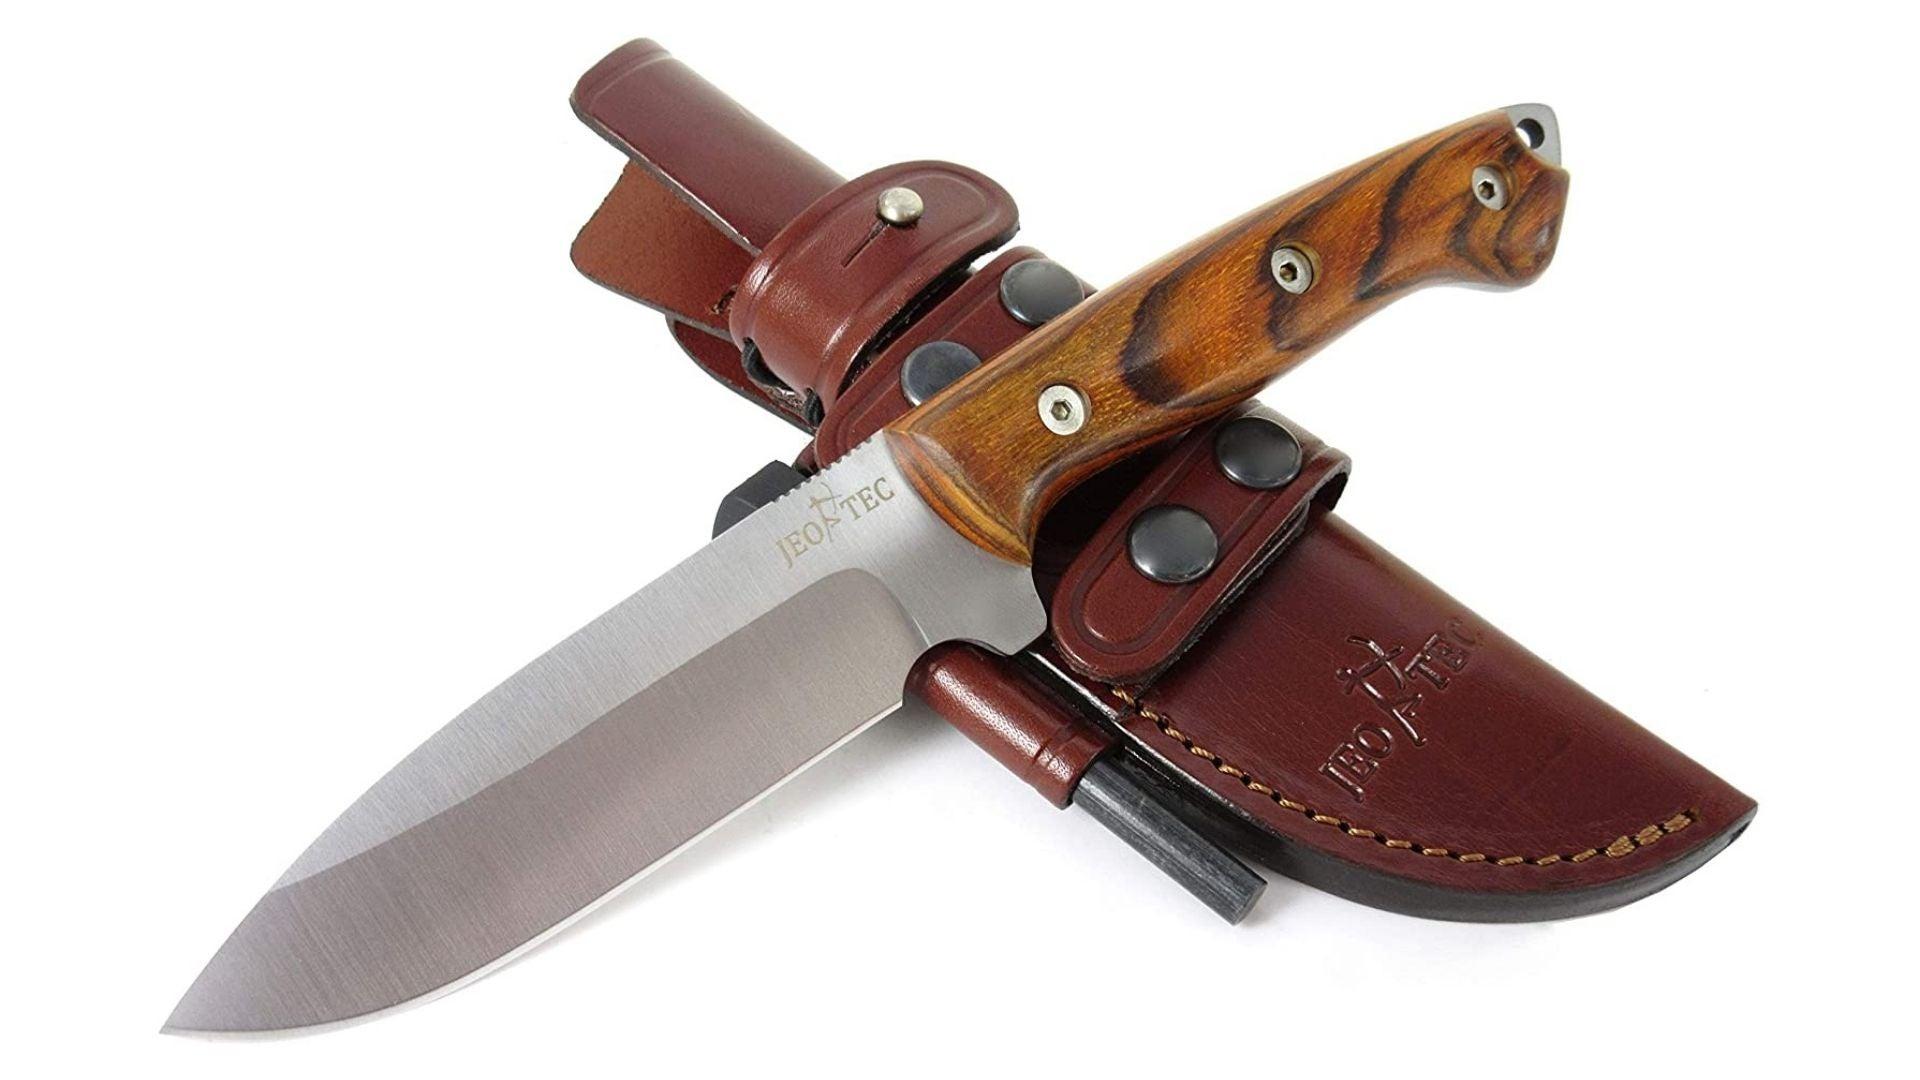 JEO-TEC Nº29 Bushcraft Survival Knife